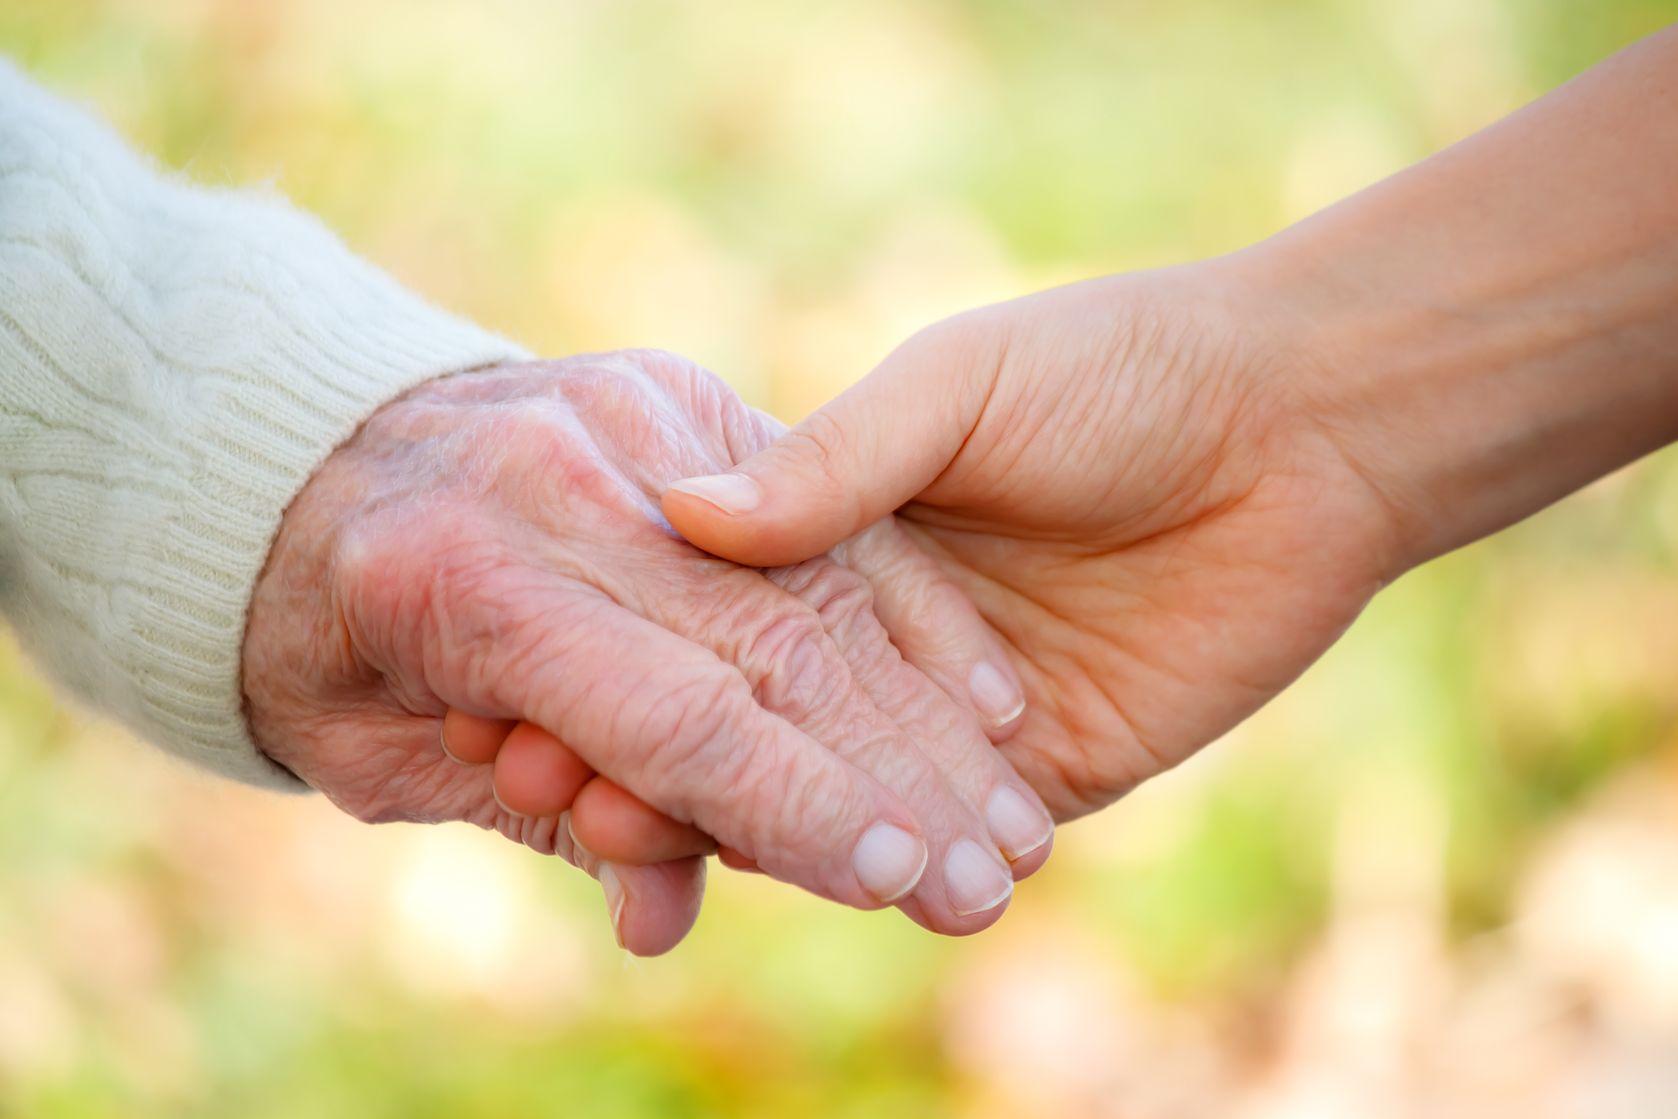 Home health care for seniors